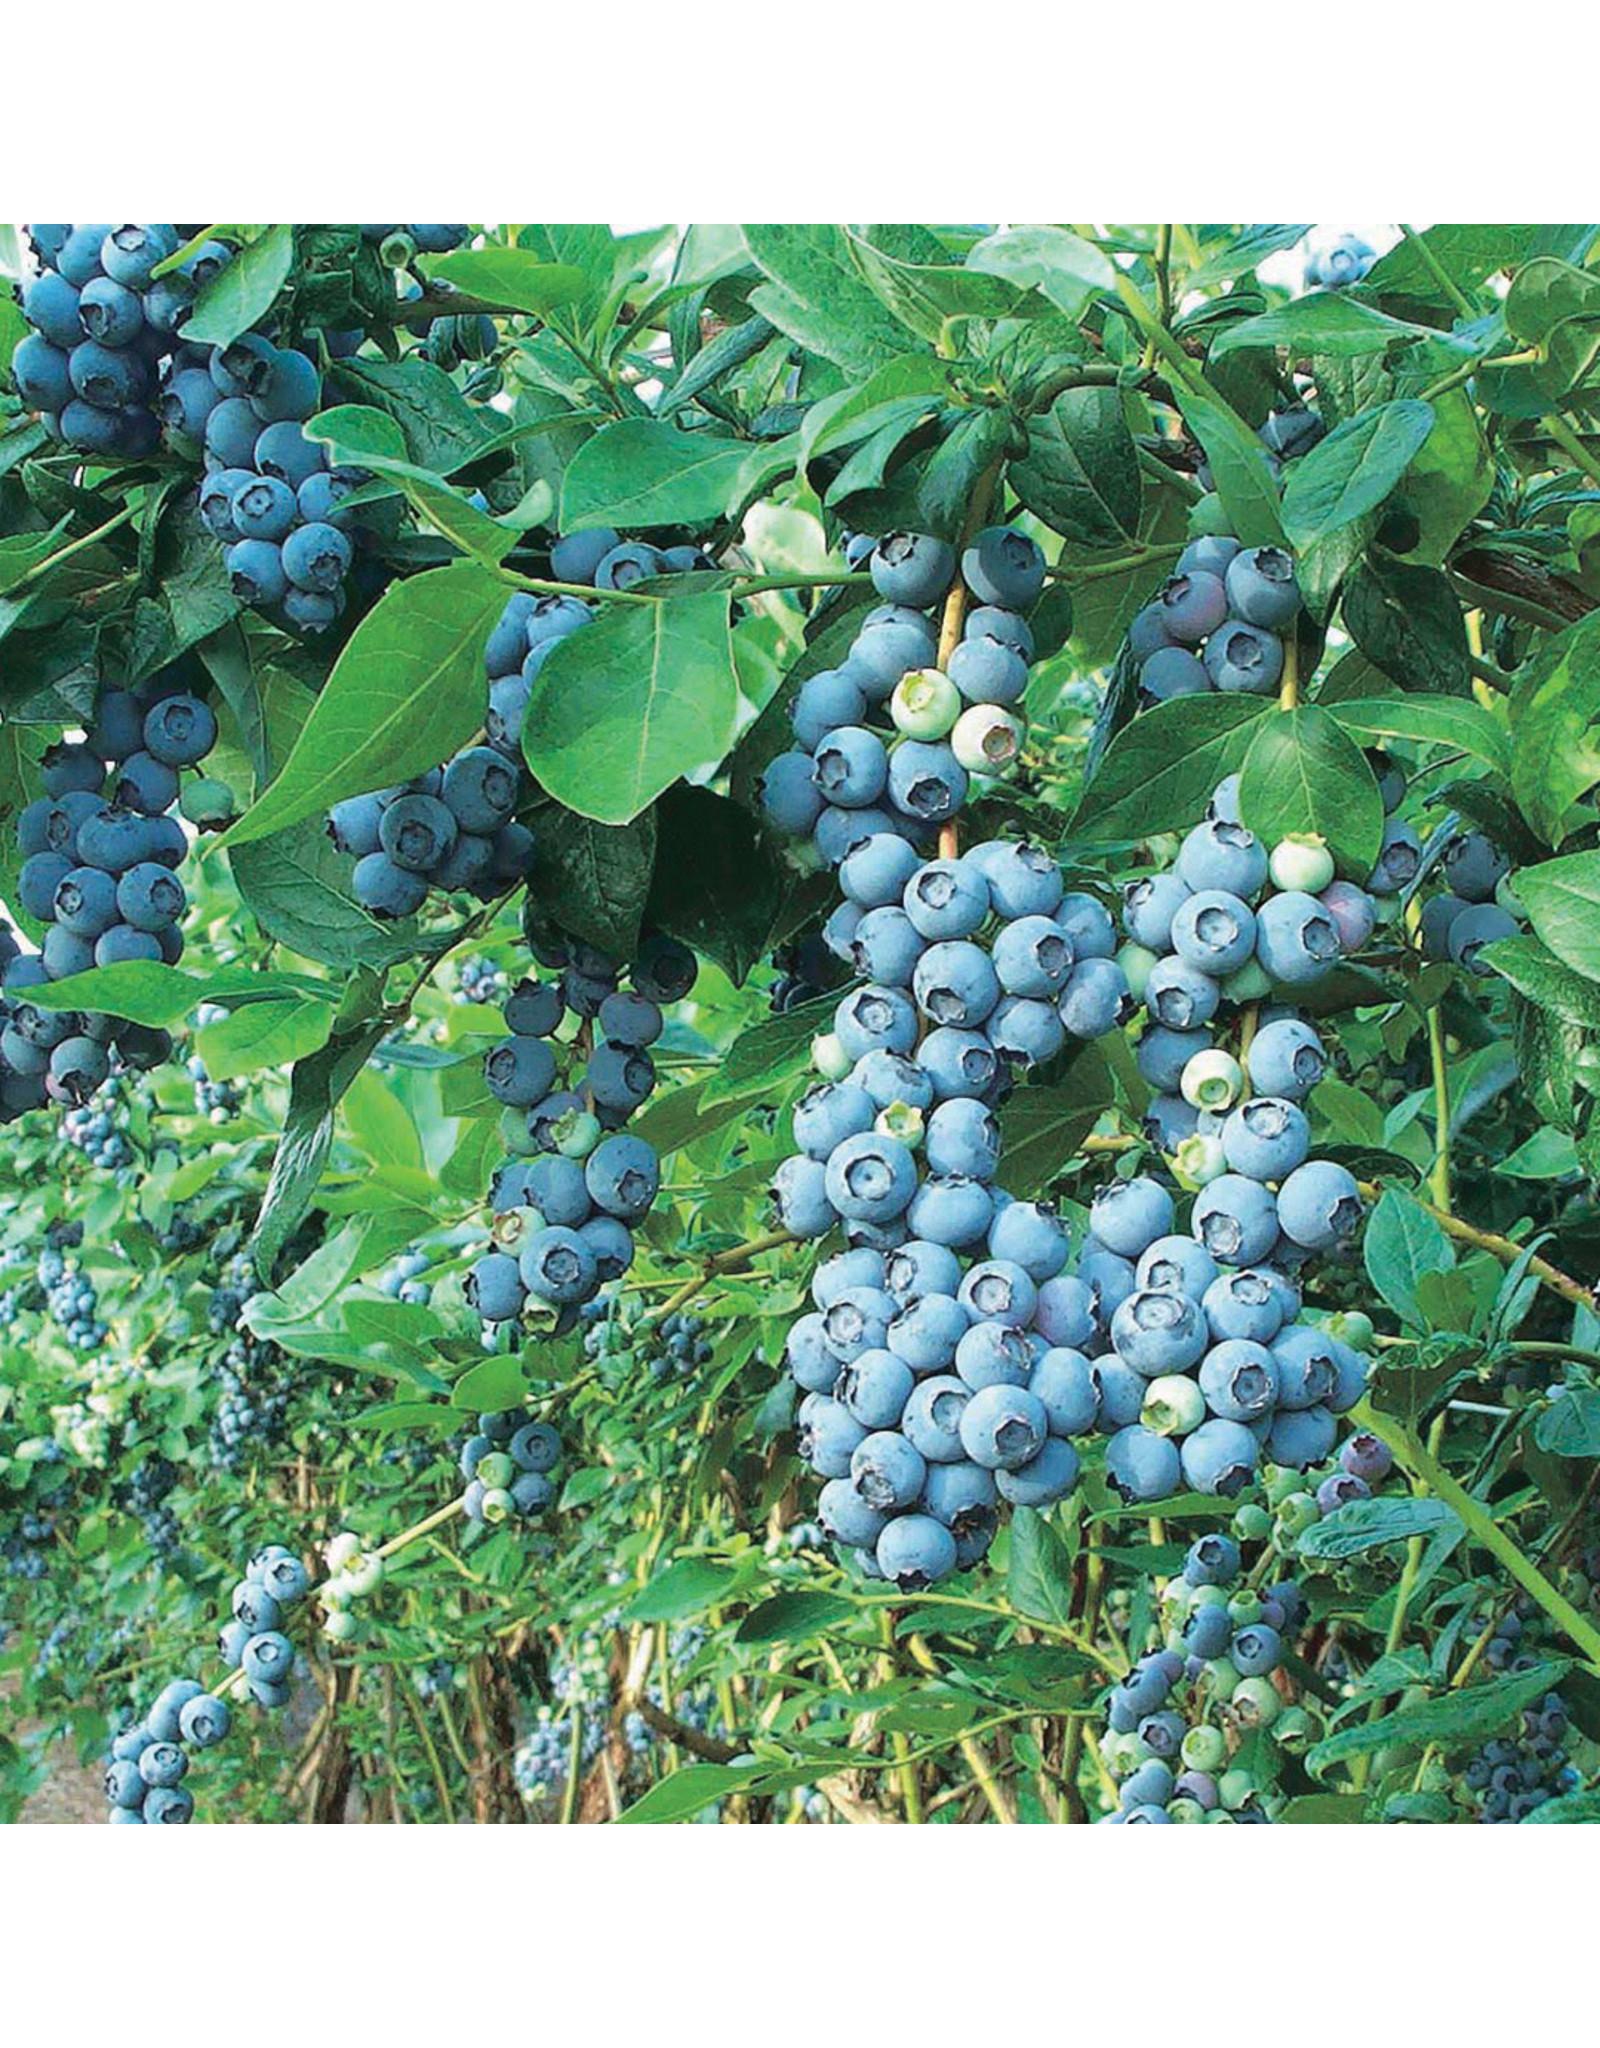 Blueberry - Chippewa - #1 - NO WARRANTY